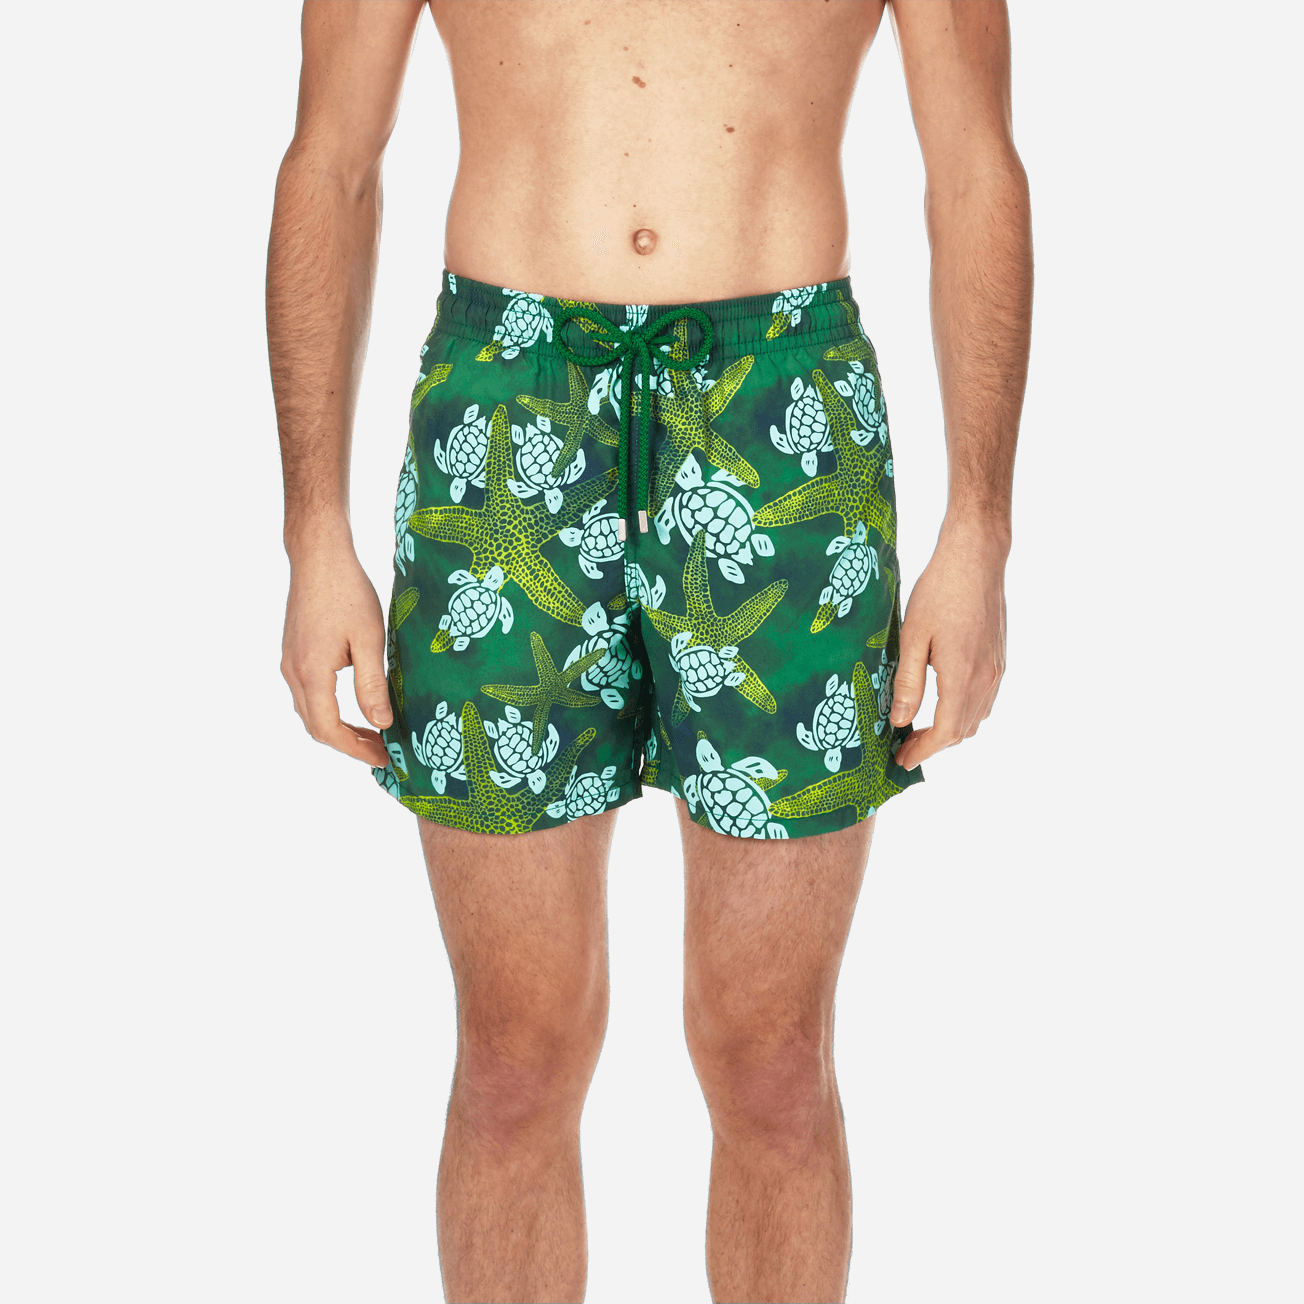 f0243e5ac5 Men Classic / Moorea Printed Swimtrunks Vintage Starlettes & Turtles in  Malachite green